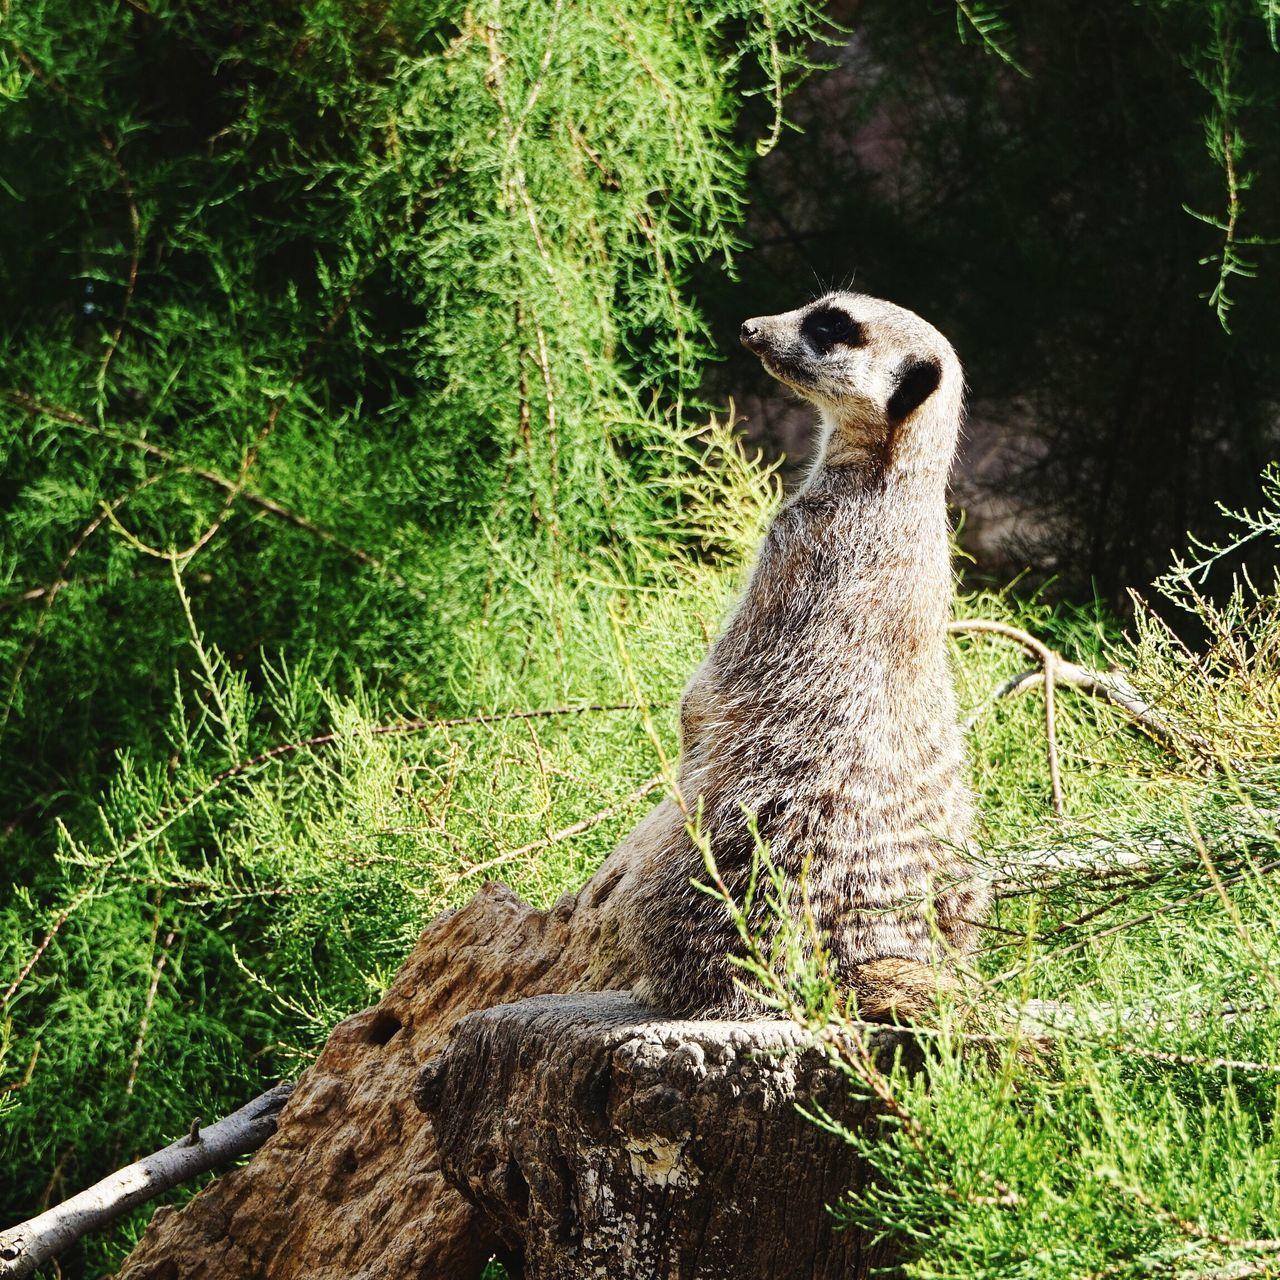 One Animal Animals In The Wild Animal Themes Mammal Nature Animal Wildlife No People Tree Outdoors Day Meerkat